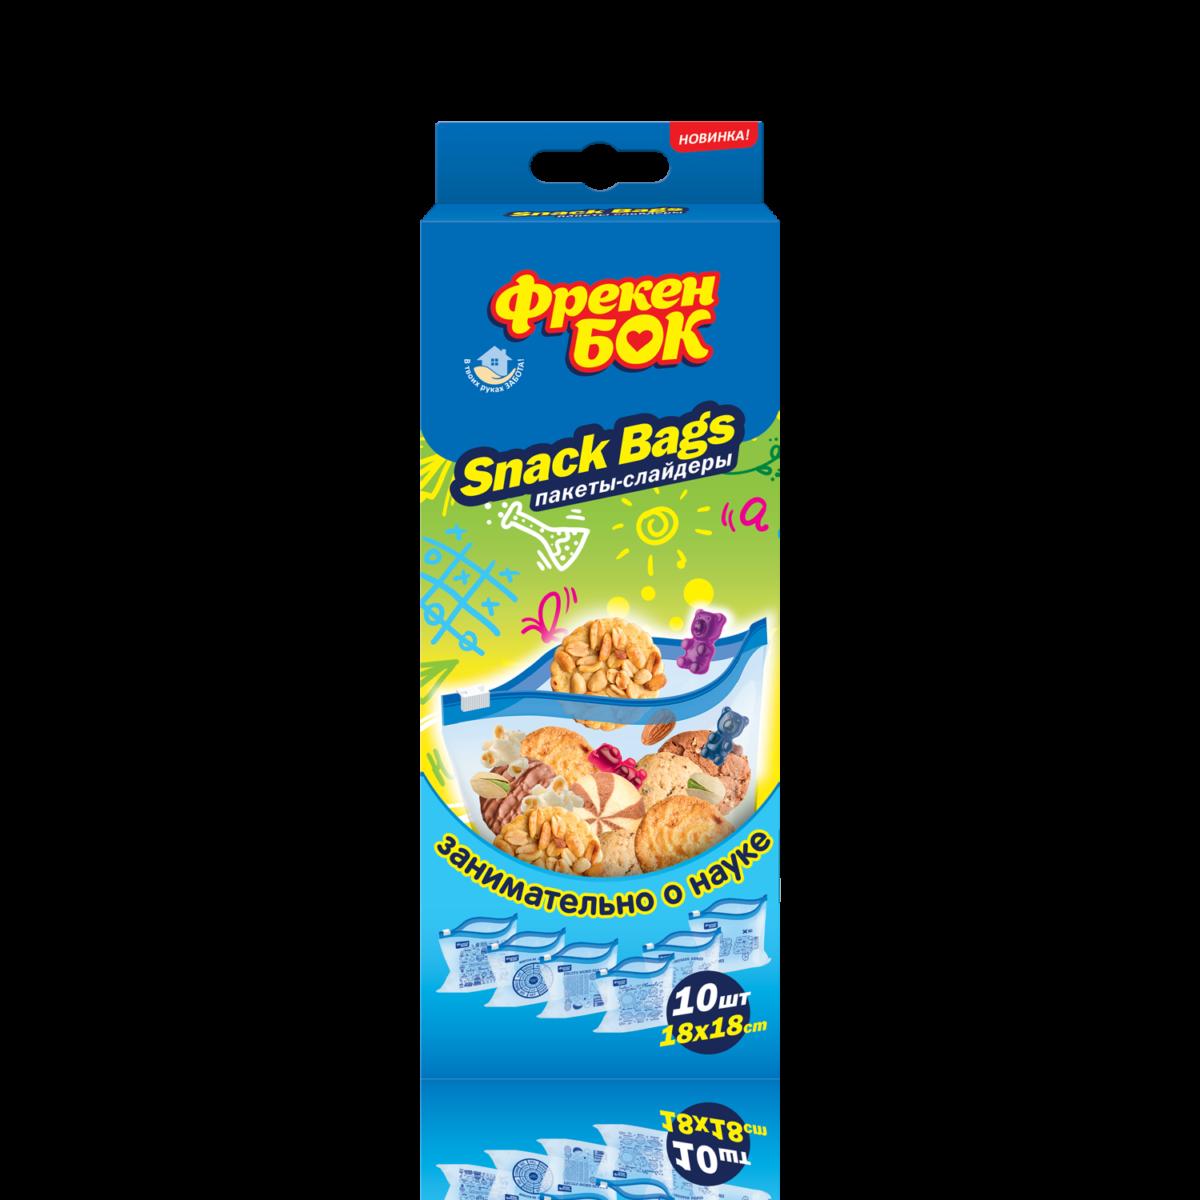 "Фрекен БОК Пакети ""Snack Bag"", 10 шт.- Фото - Biosphere"